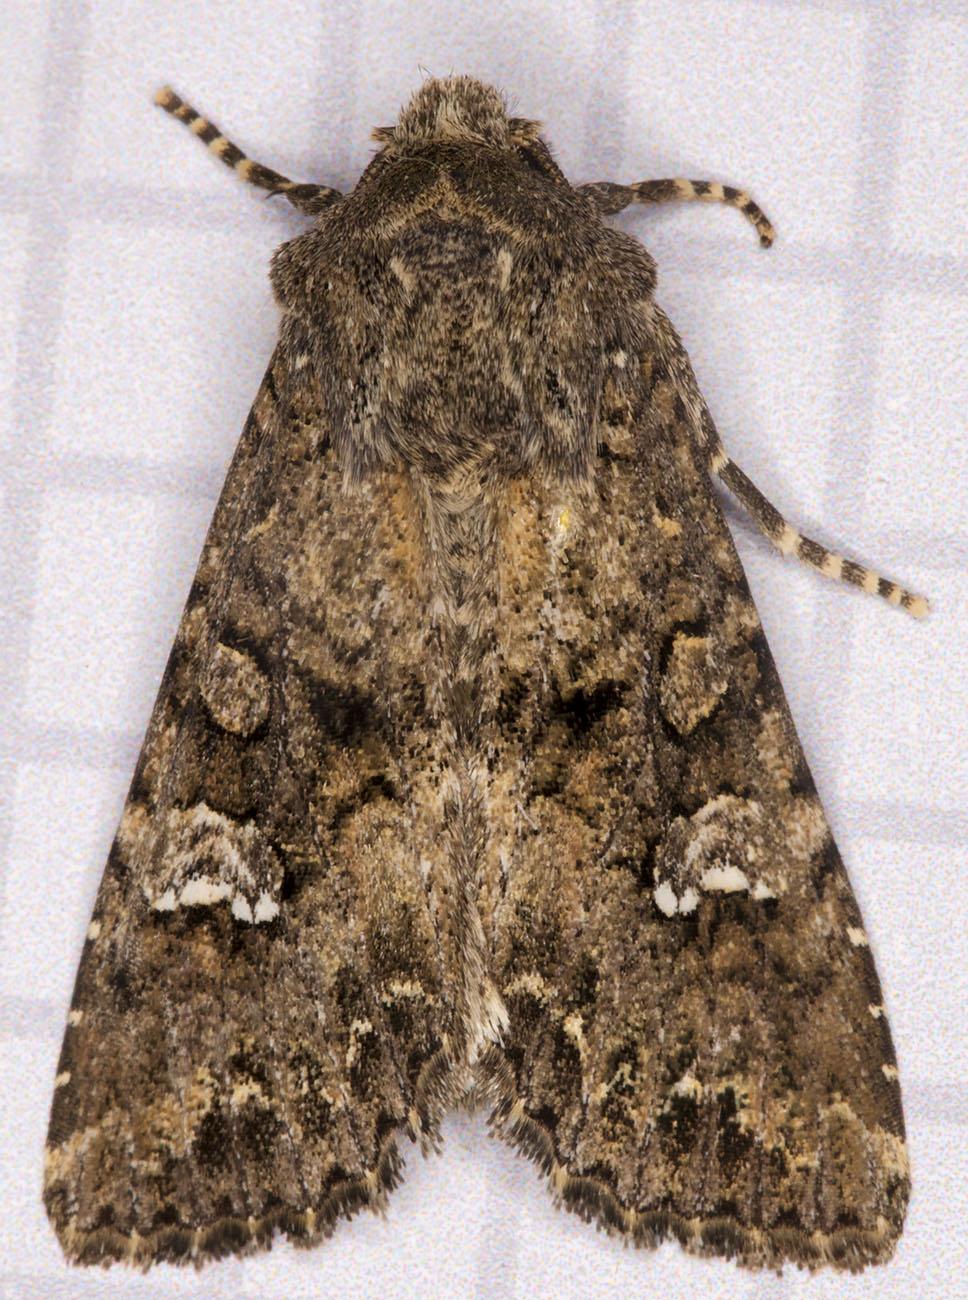 Cabbage Moth, Mamestra brassicae.  Noctuidae.  Hayes, 22 June 2014.